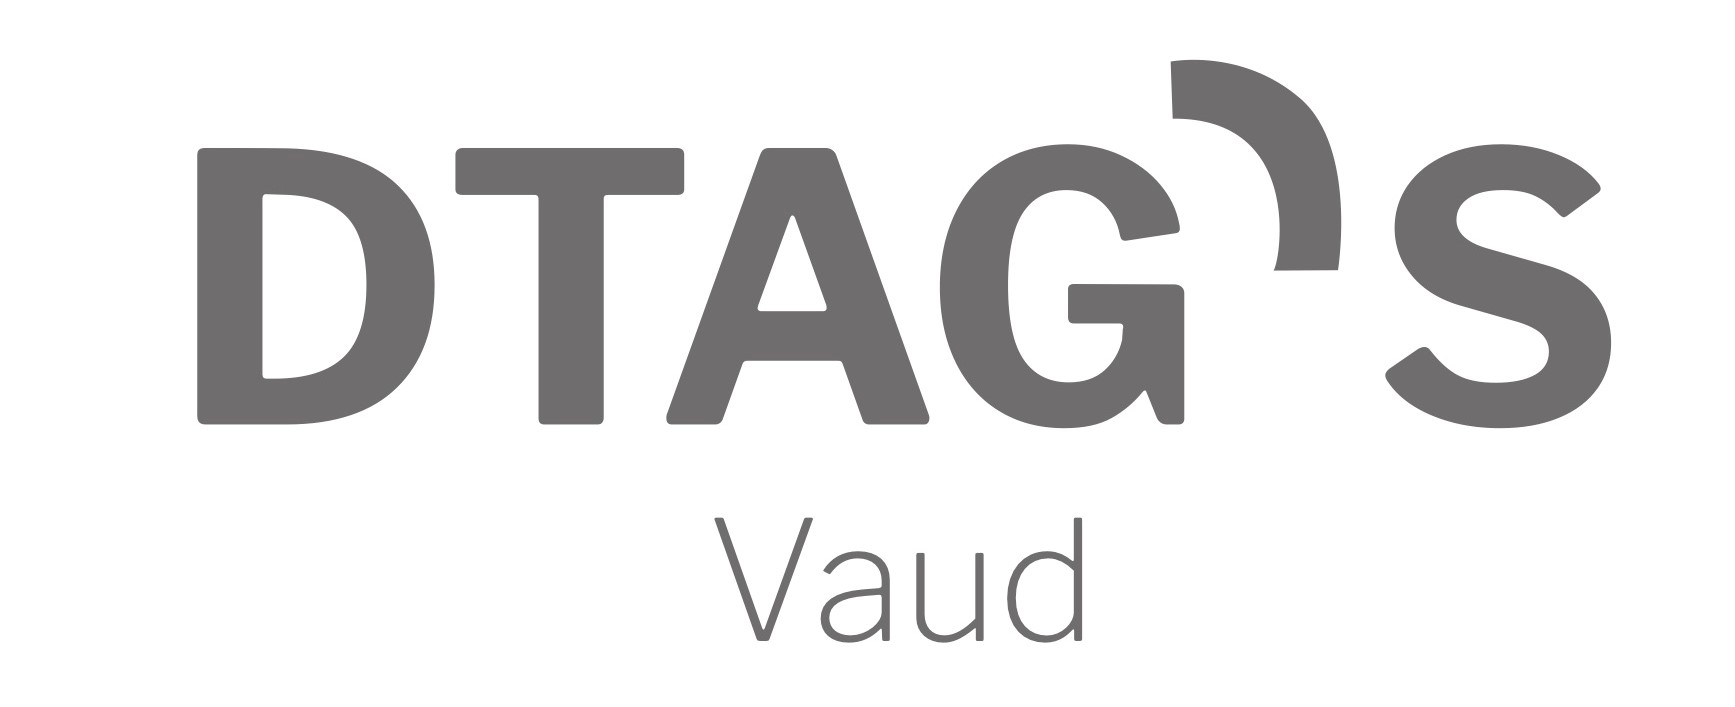 DTAG'S Vaud Sàrl